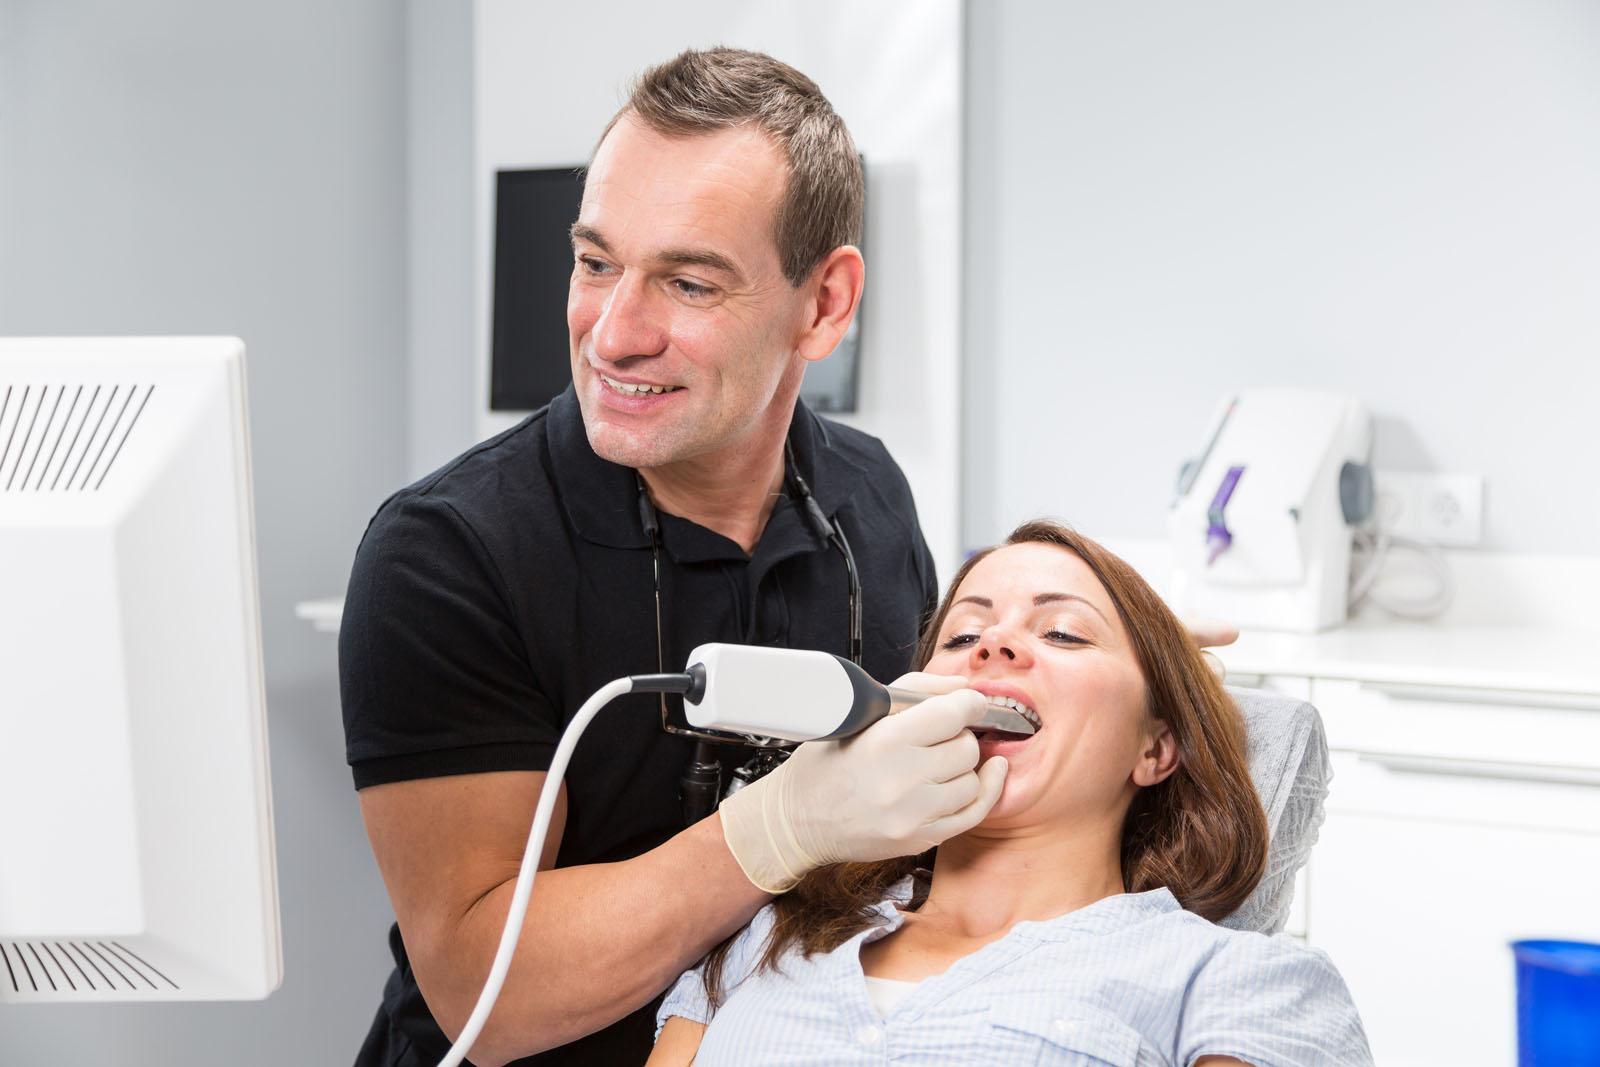 CEREC Cad-cam Dentistry